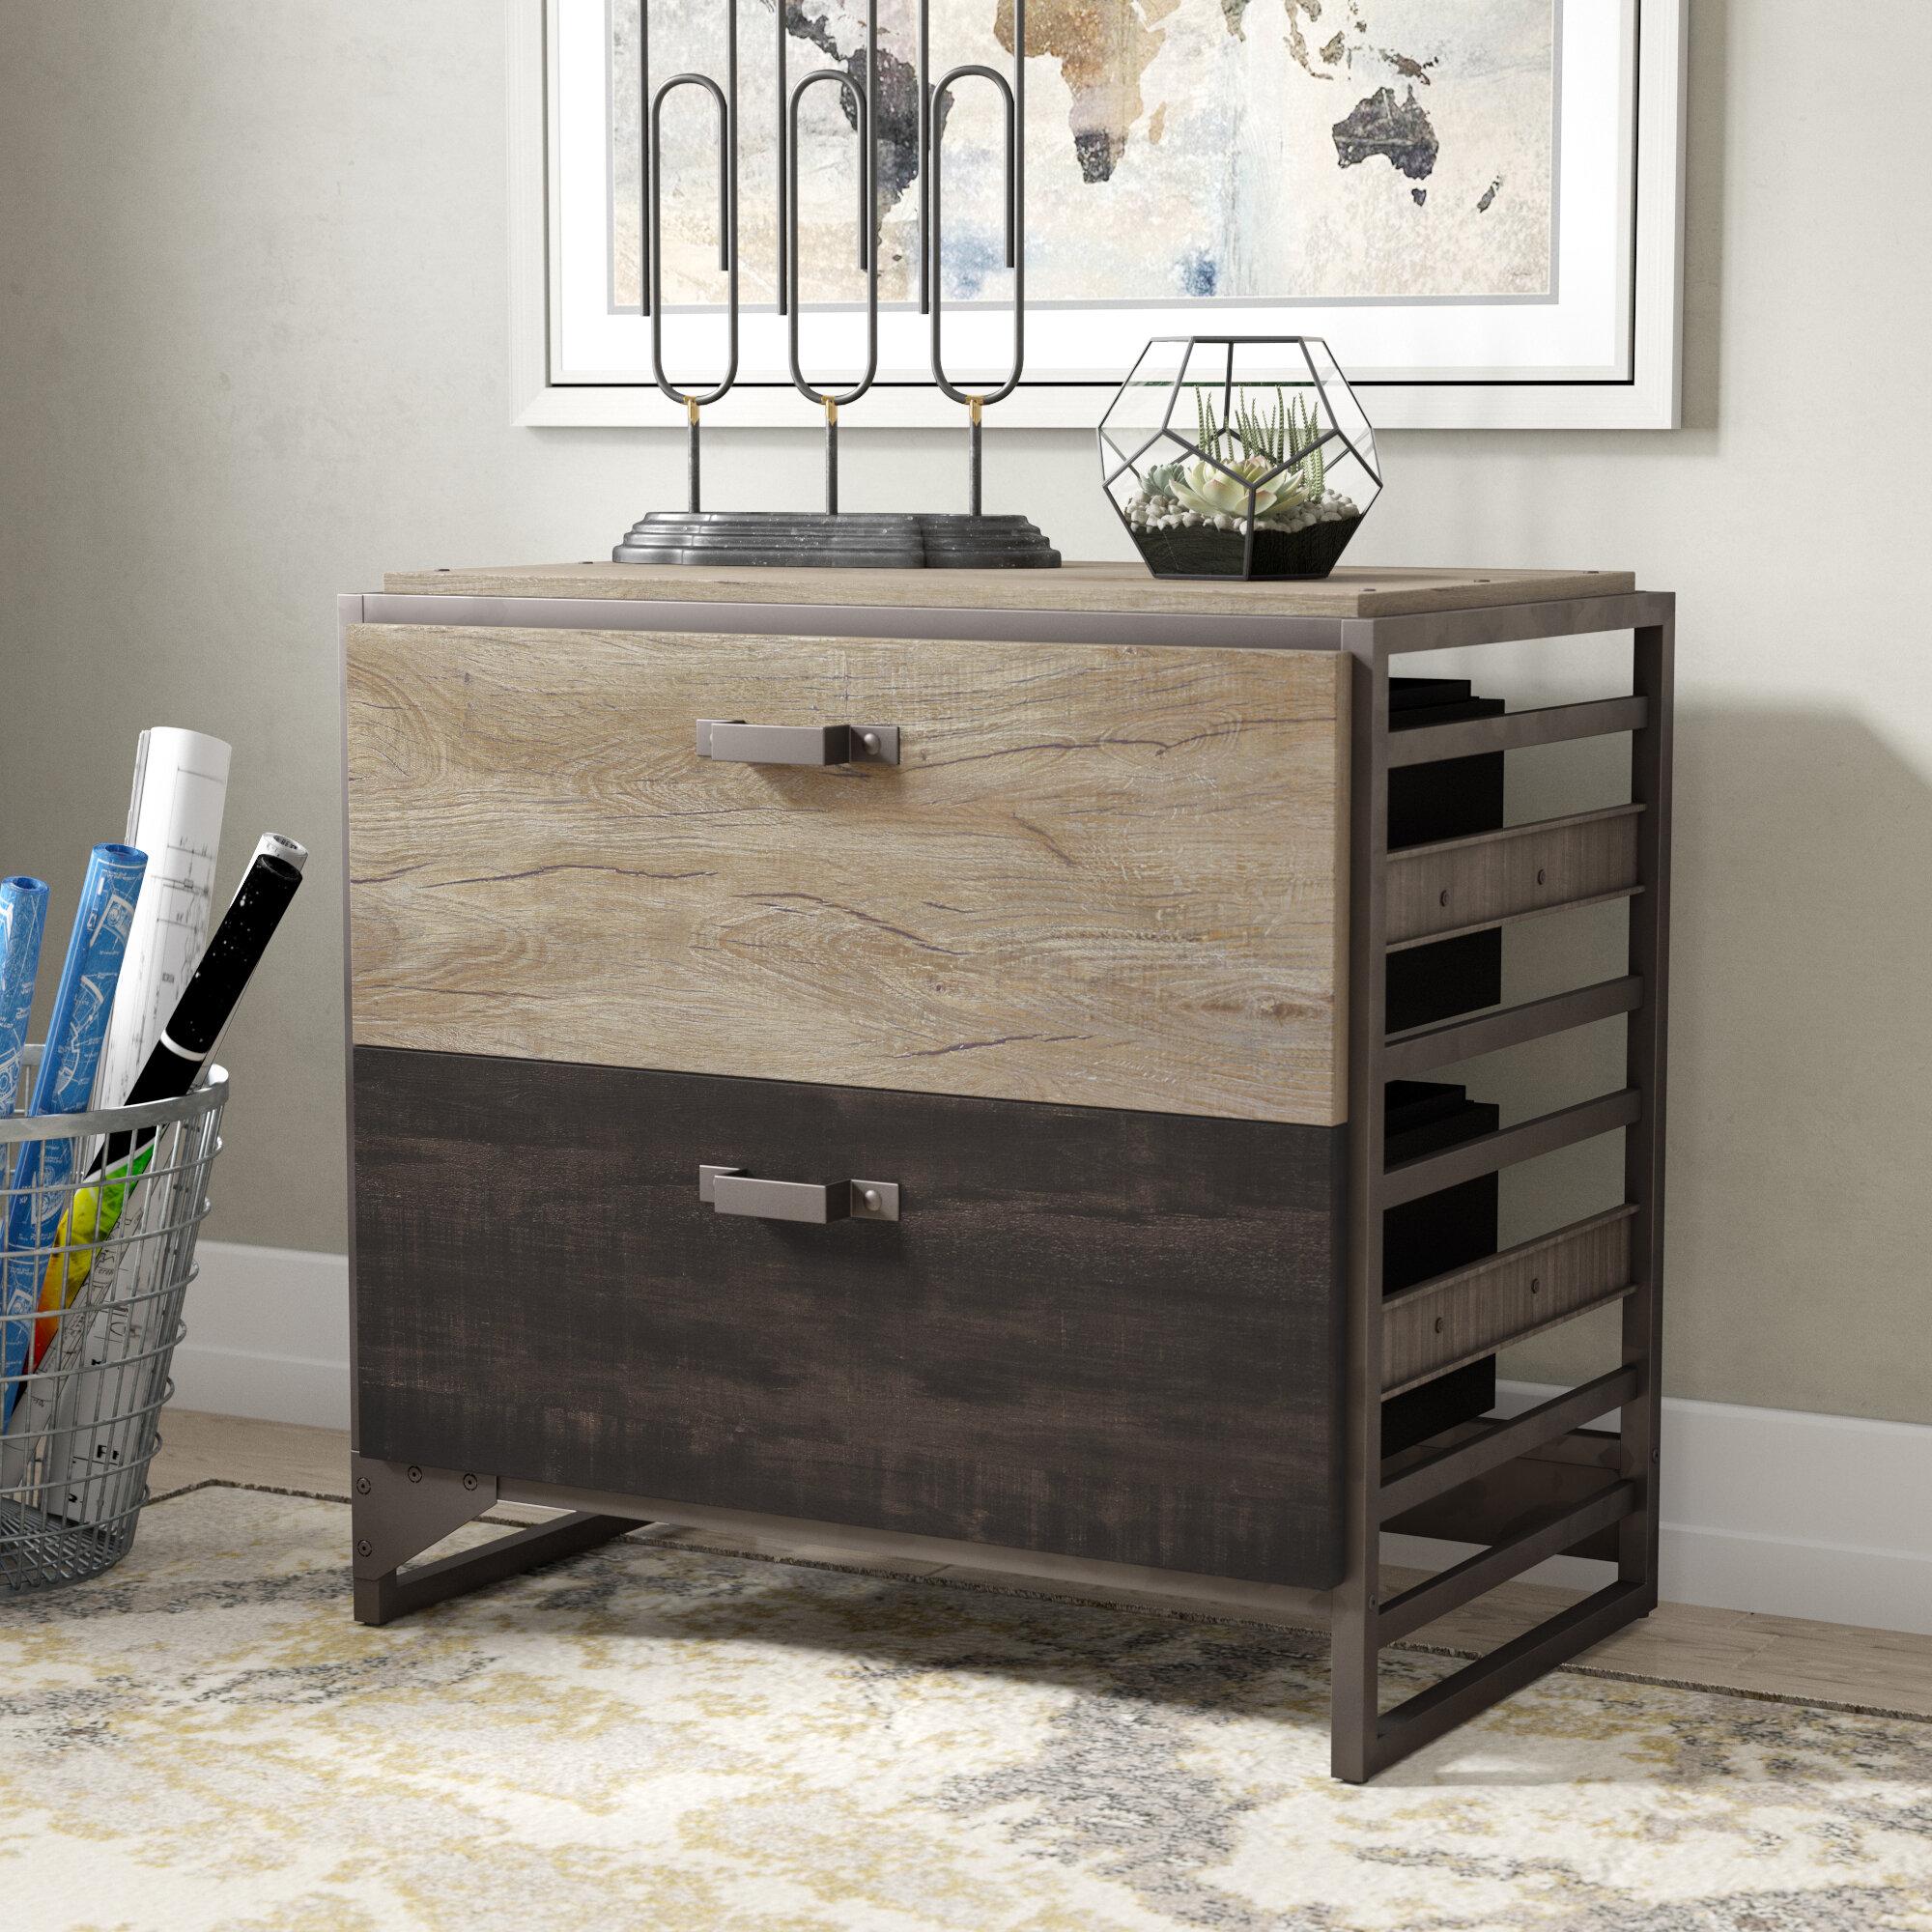 Williston Forge Riverside 2 Drawer Lateral Filing Cabinet U0026 Reviews |  Wayfair